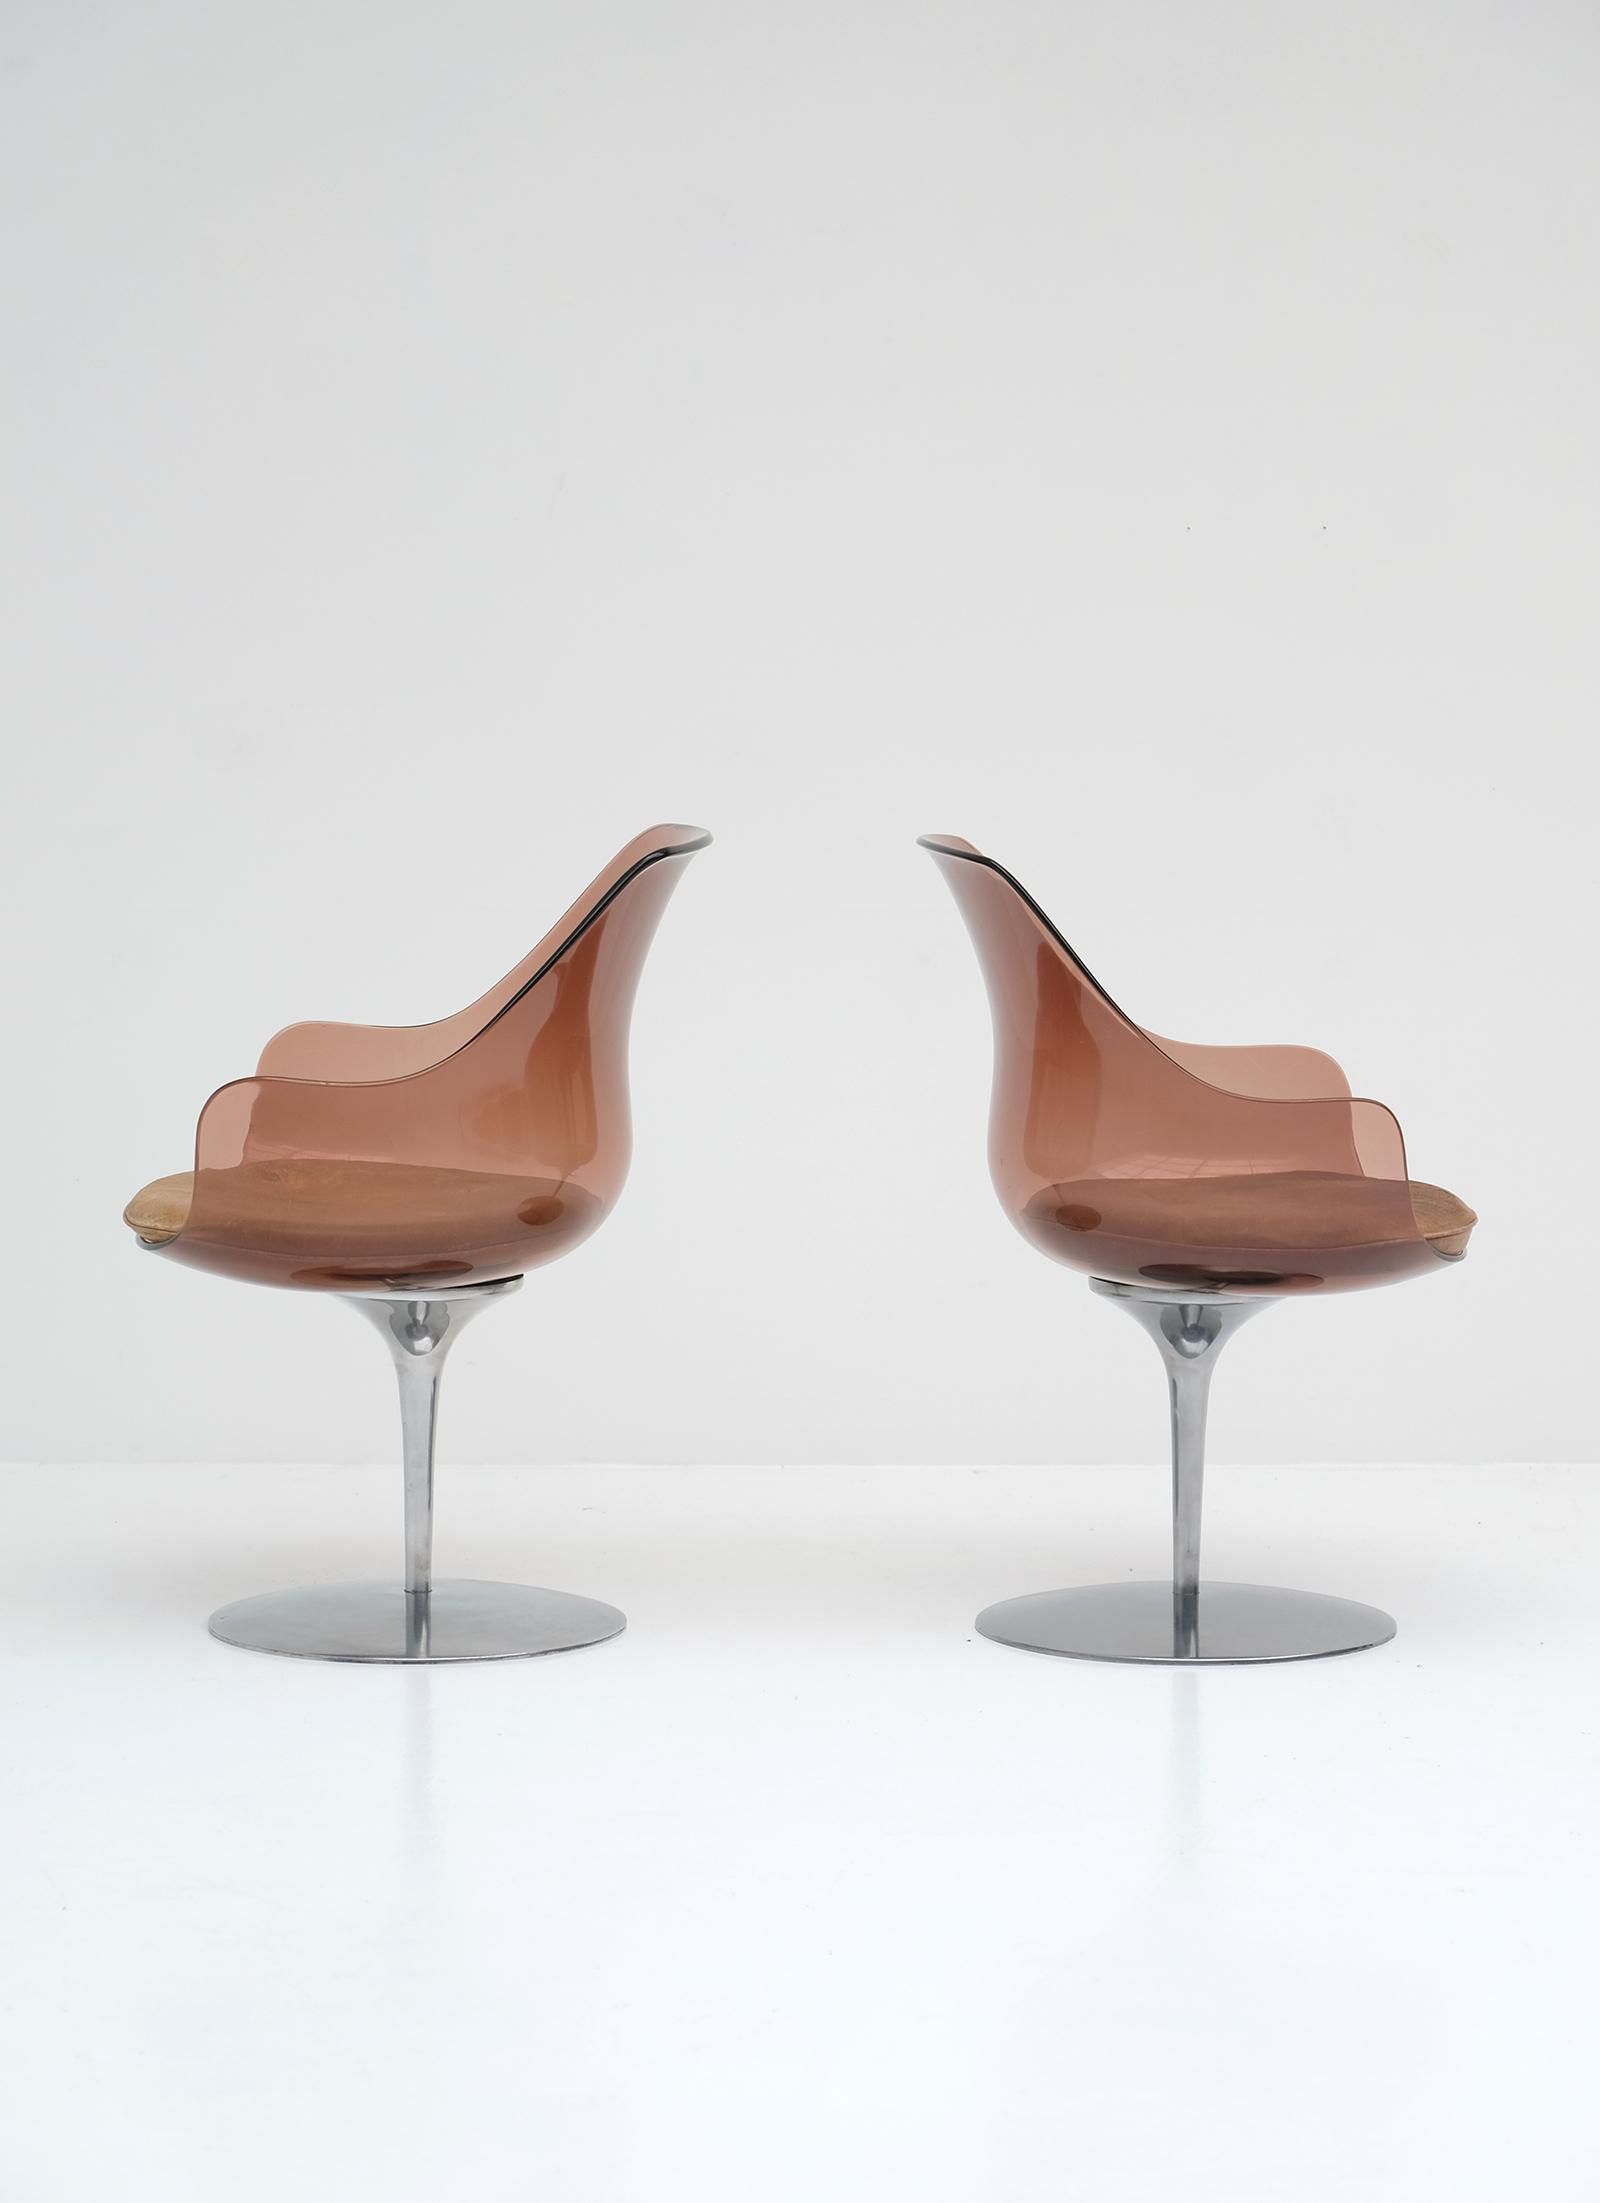 Laverne Champagne Chairs Formes Nouvellesimage 6